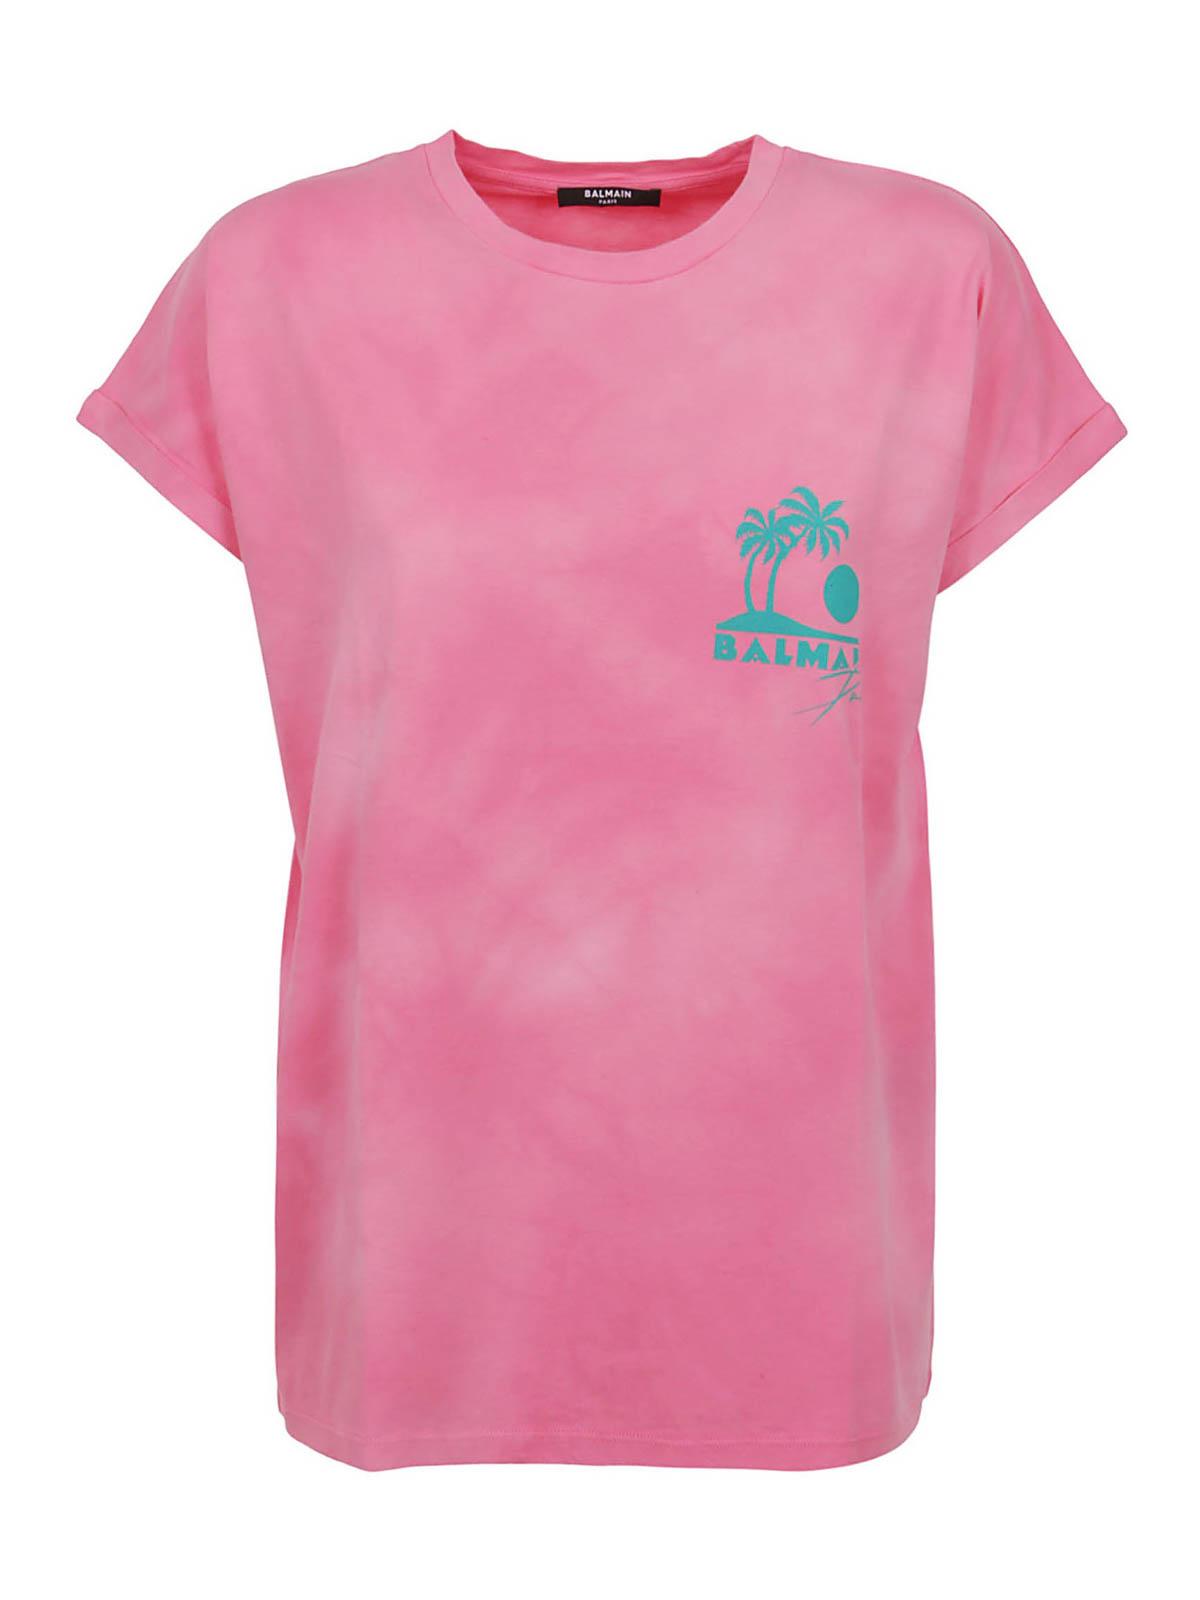 Balmain T-shirts TIE-DYE PALM TREE LOGO T-SHIRT